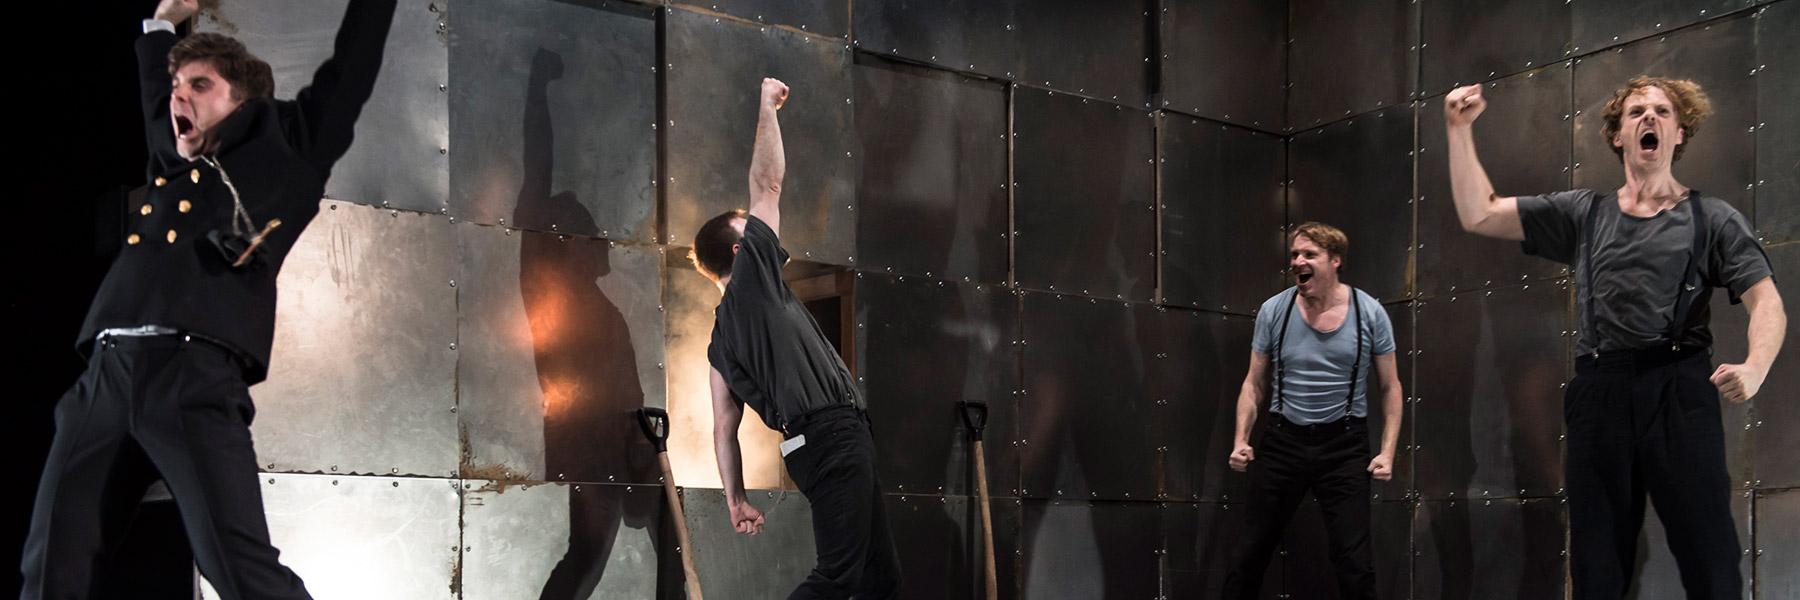 Esens Kulturell Konzerte Lesungen Theateraufführungen